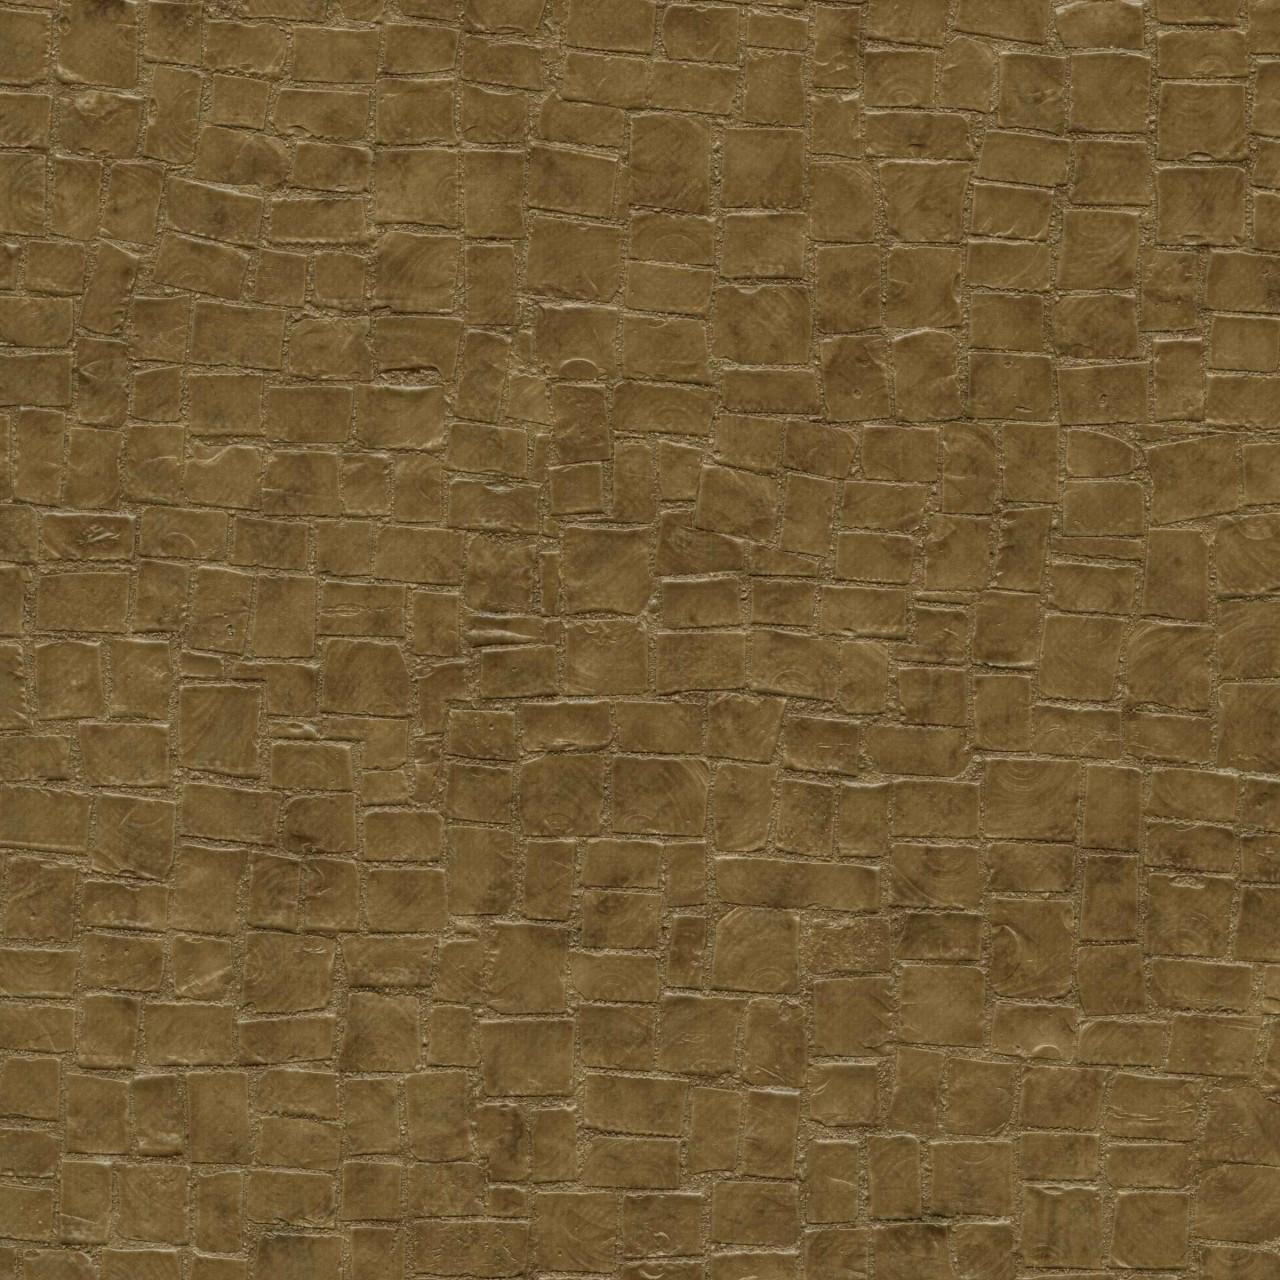 Brown 988102 Faux Stone Wallpaper   Textures Wallpaper 1280x1280